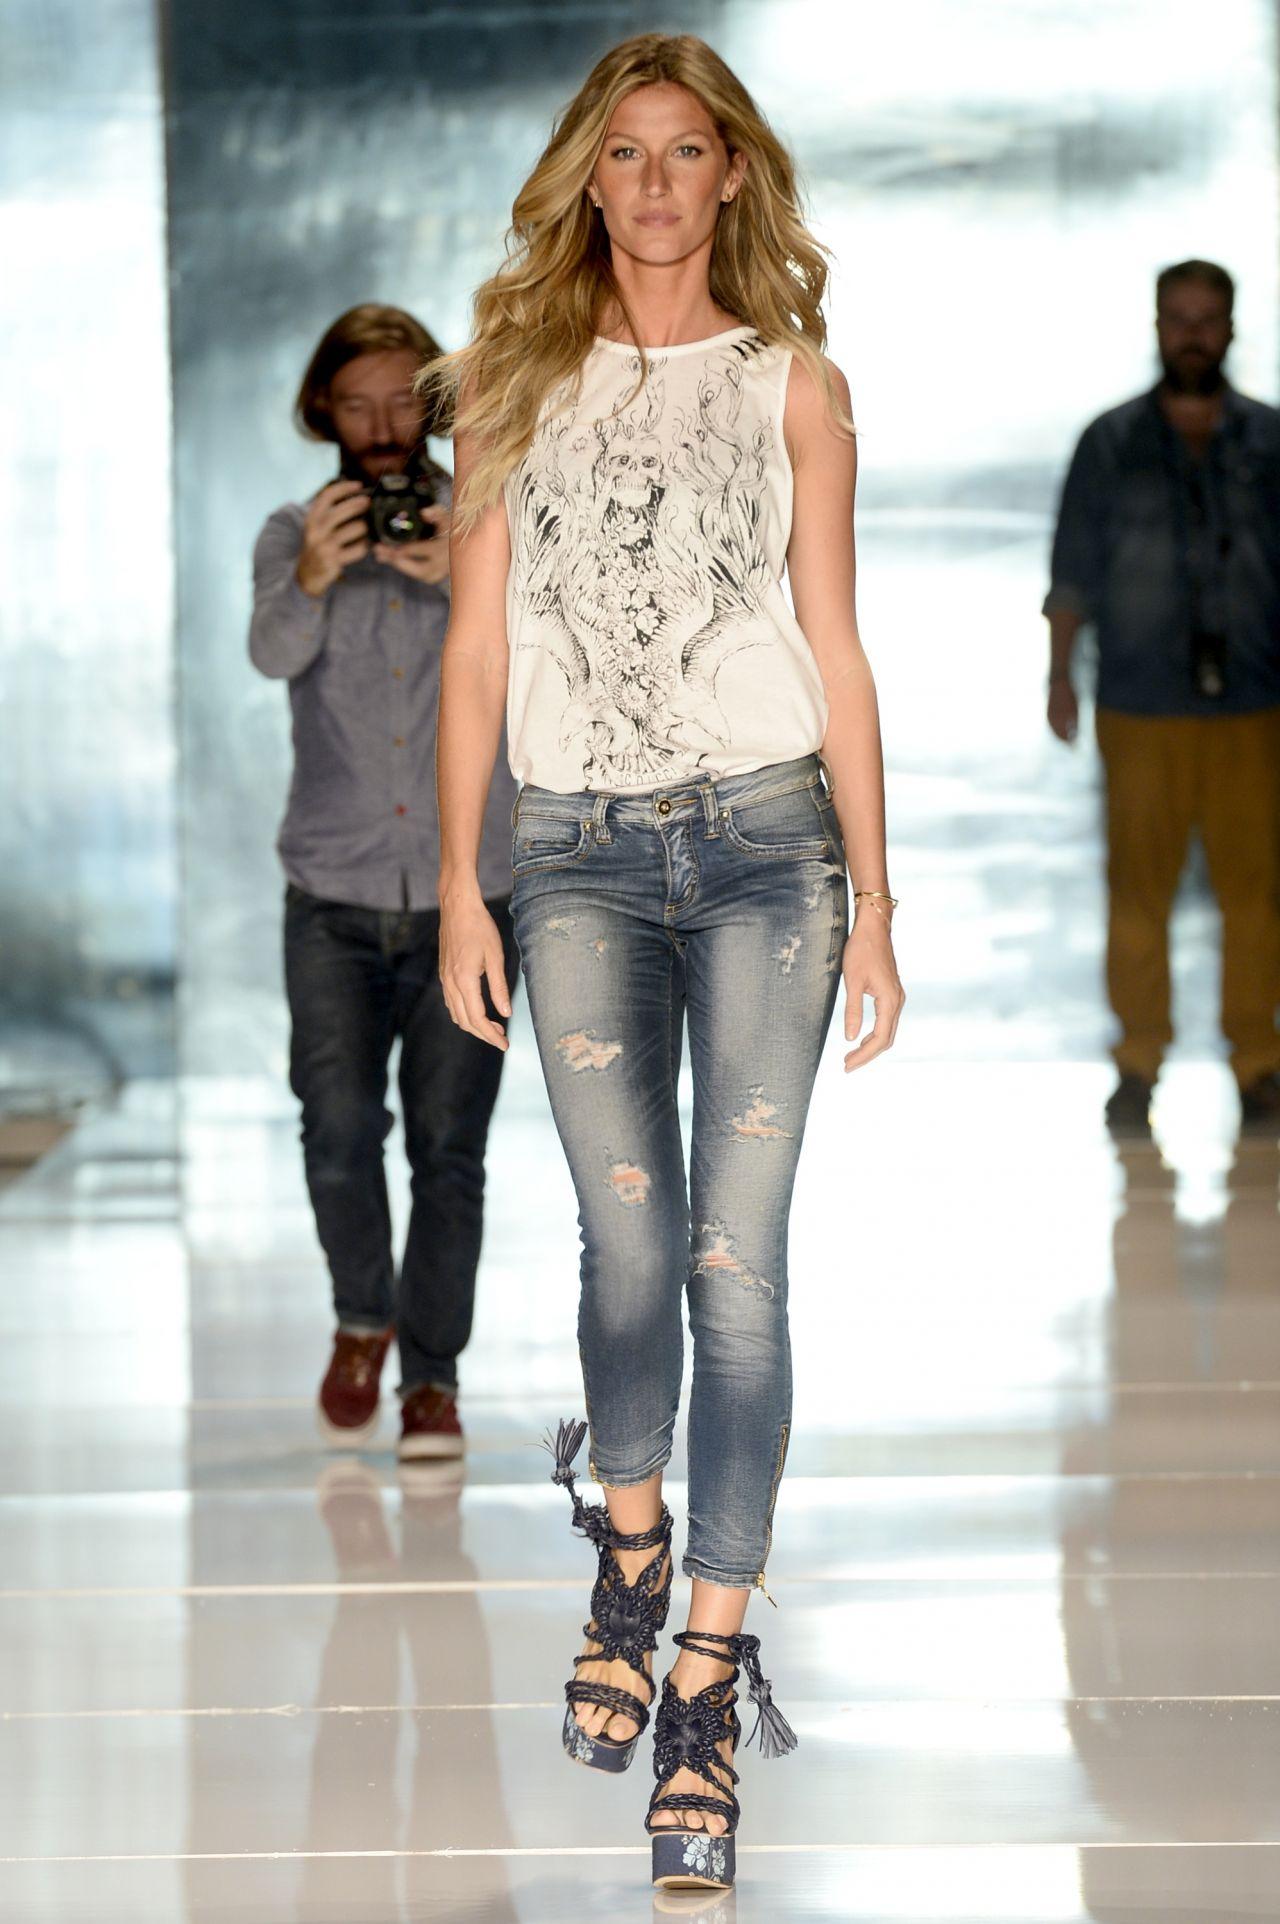 #VagabombPicks: Gisele Bundchen's Top 34 Looks Over the Years